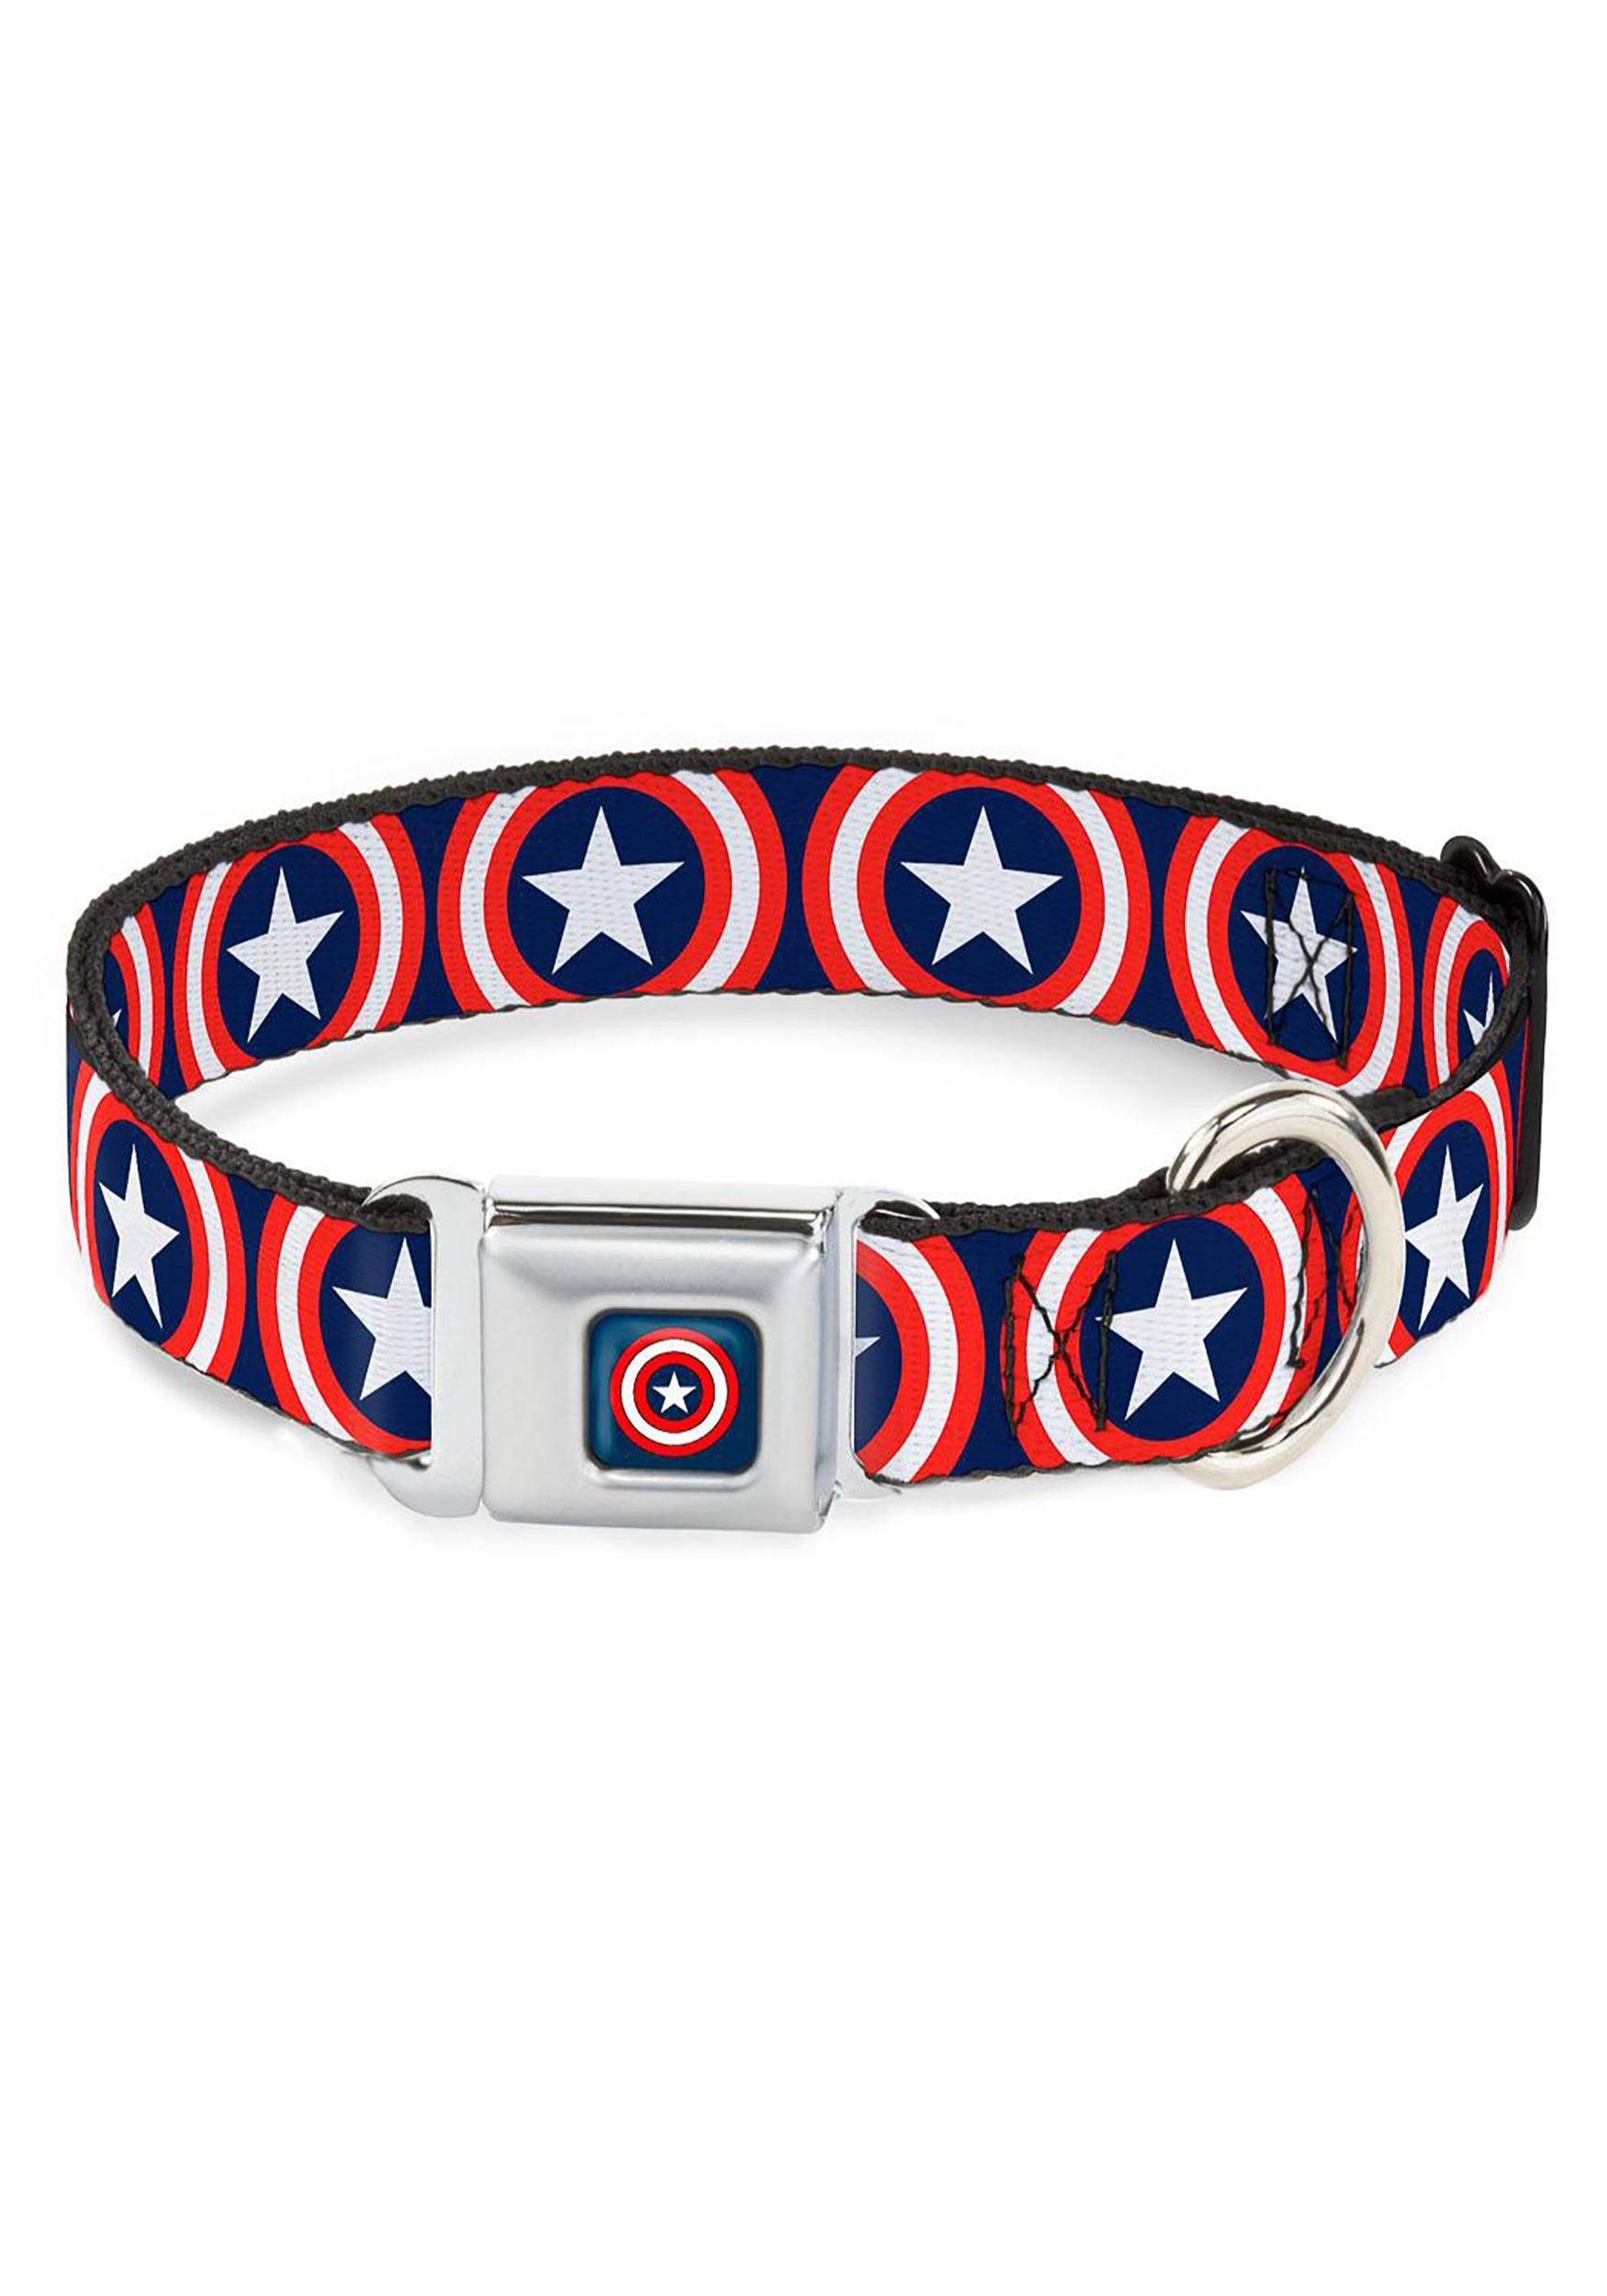 Captain_America_Shield_Logo_Seatbelt_Buckle_Dog_Collar_1_Wide